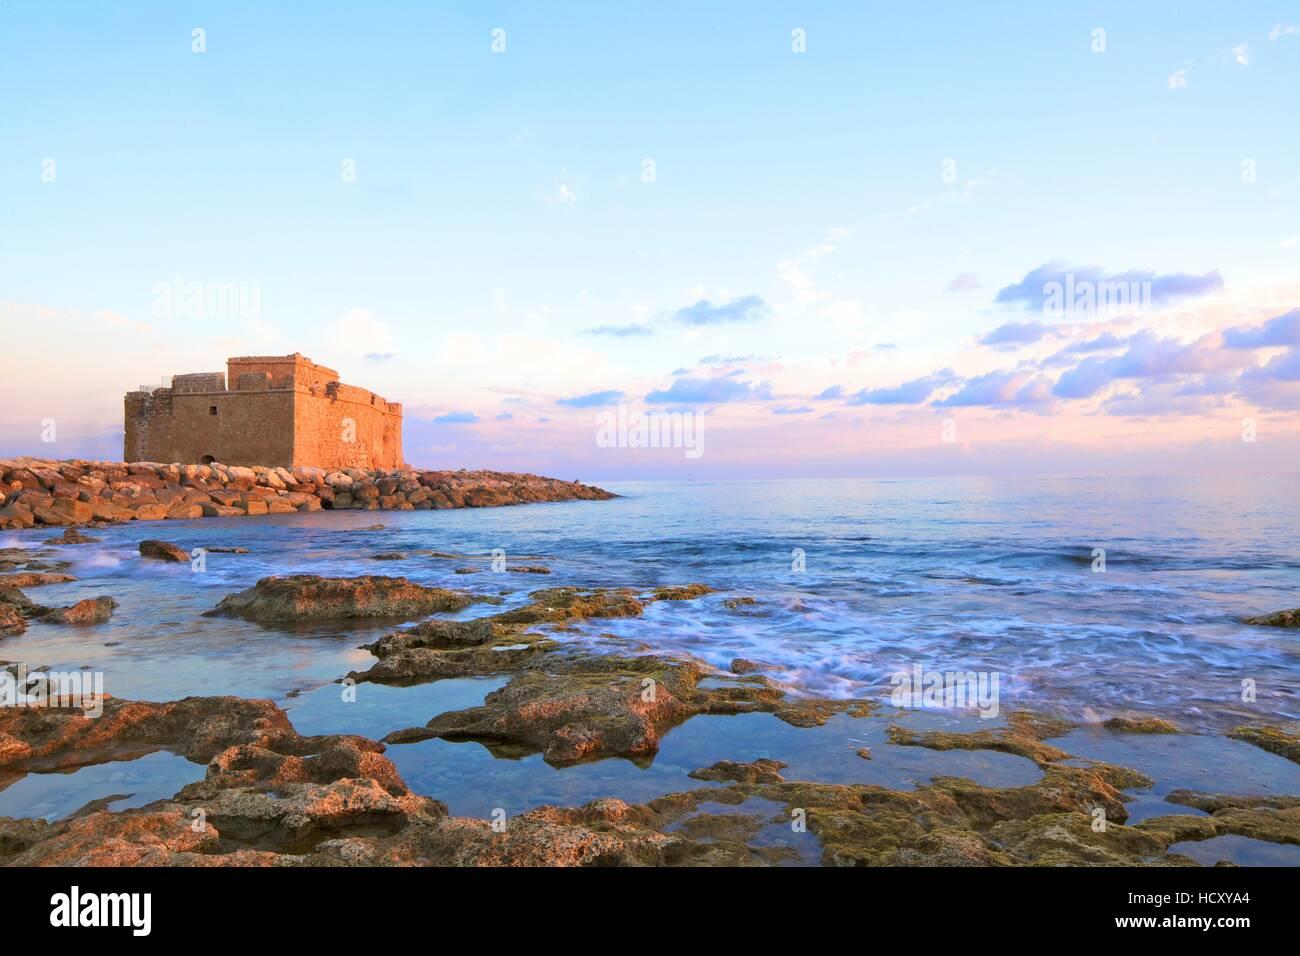 Paphos Castle, Paphos, Cyprus, Eastern Mediterranean Sea - Stock Image